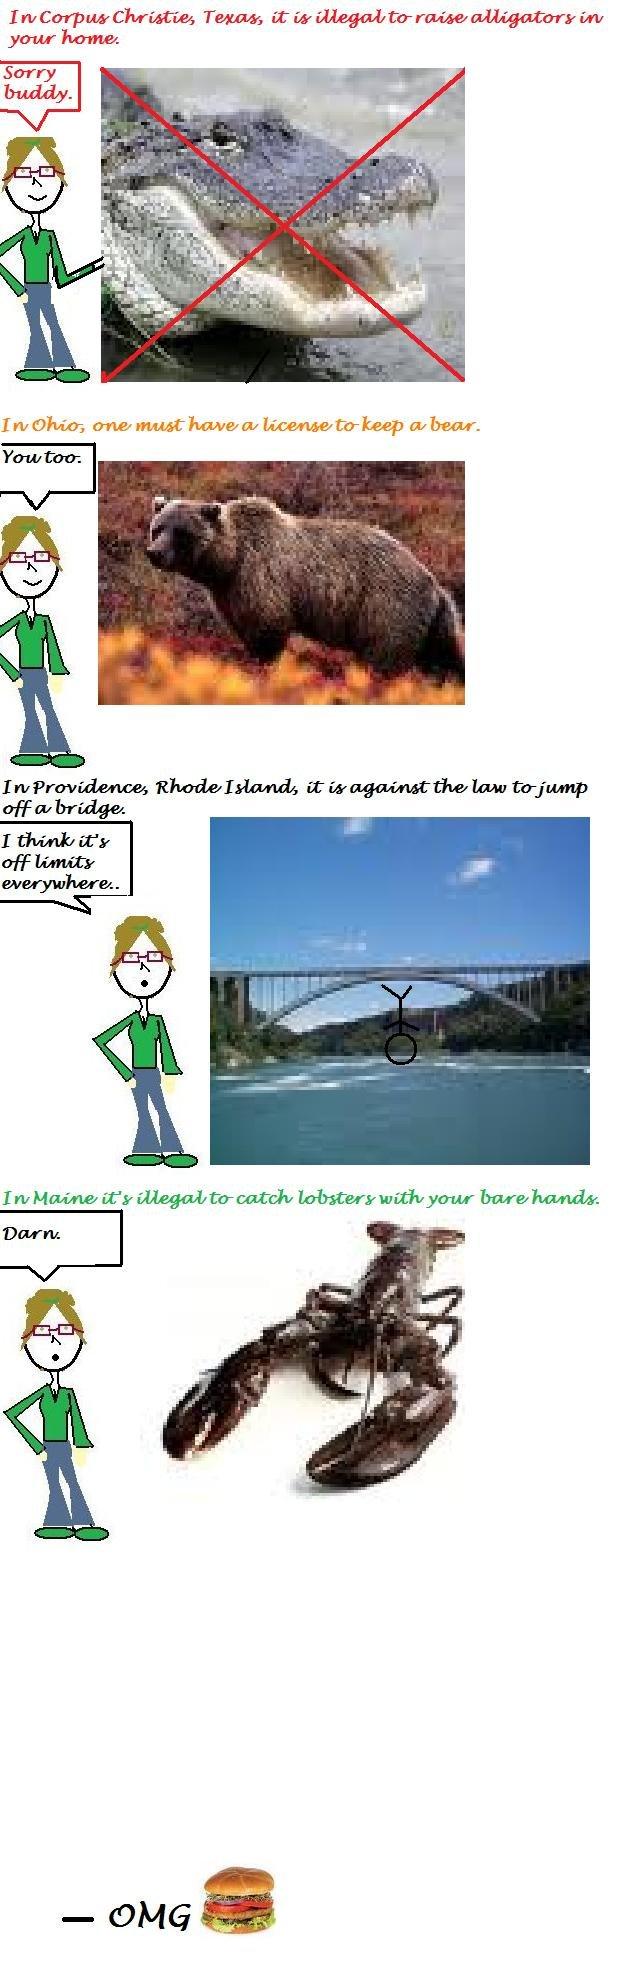 Weird Laws. Enjoy. .. Bear, alligator, lobster, bridge. Which does not belong? haha weird strange la